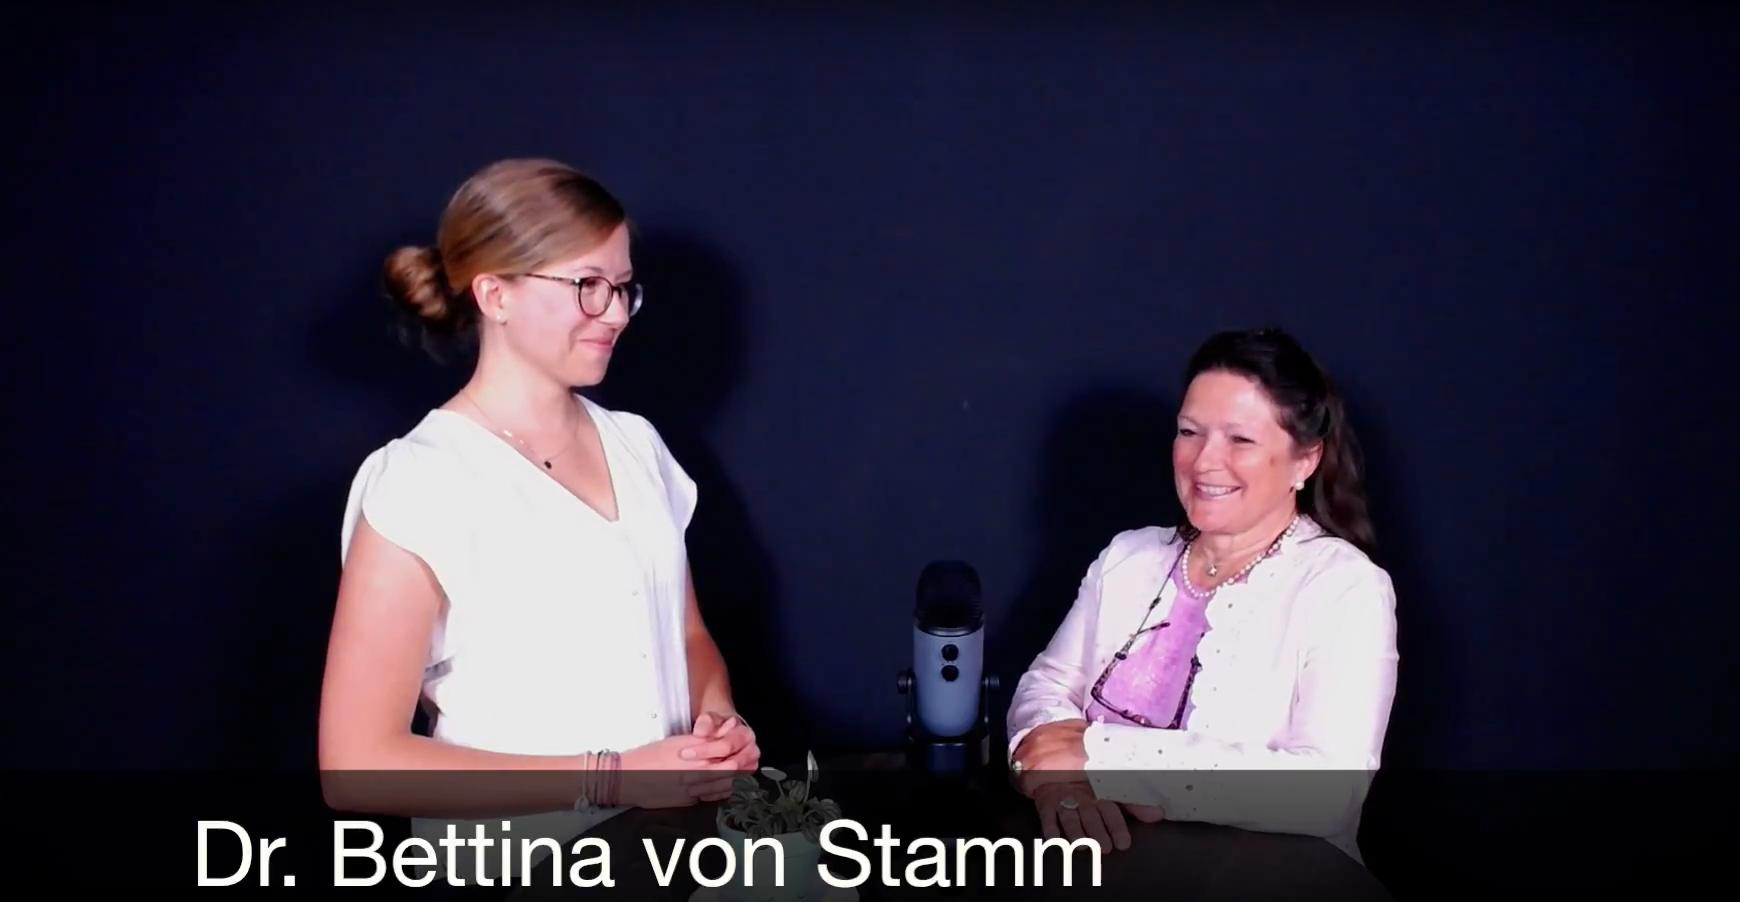 Innovation Konzept Dr. Bettina von Stamm the changing concepts of innovation